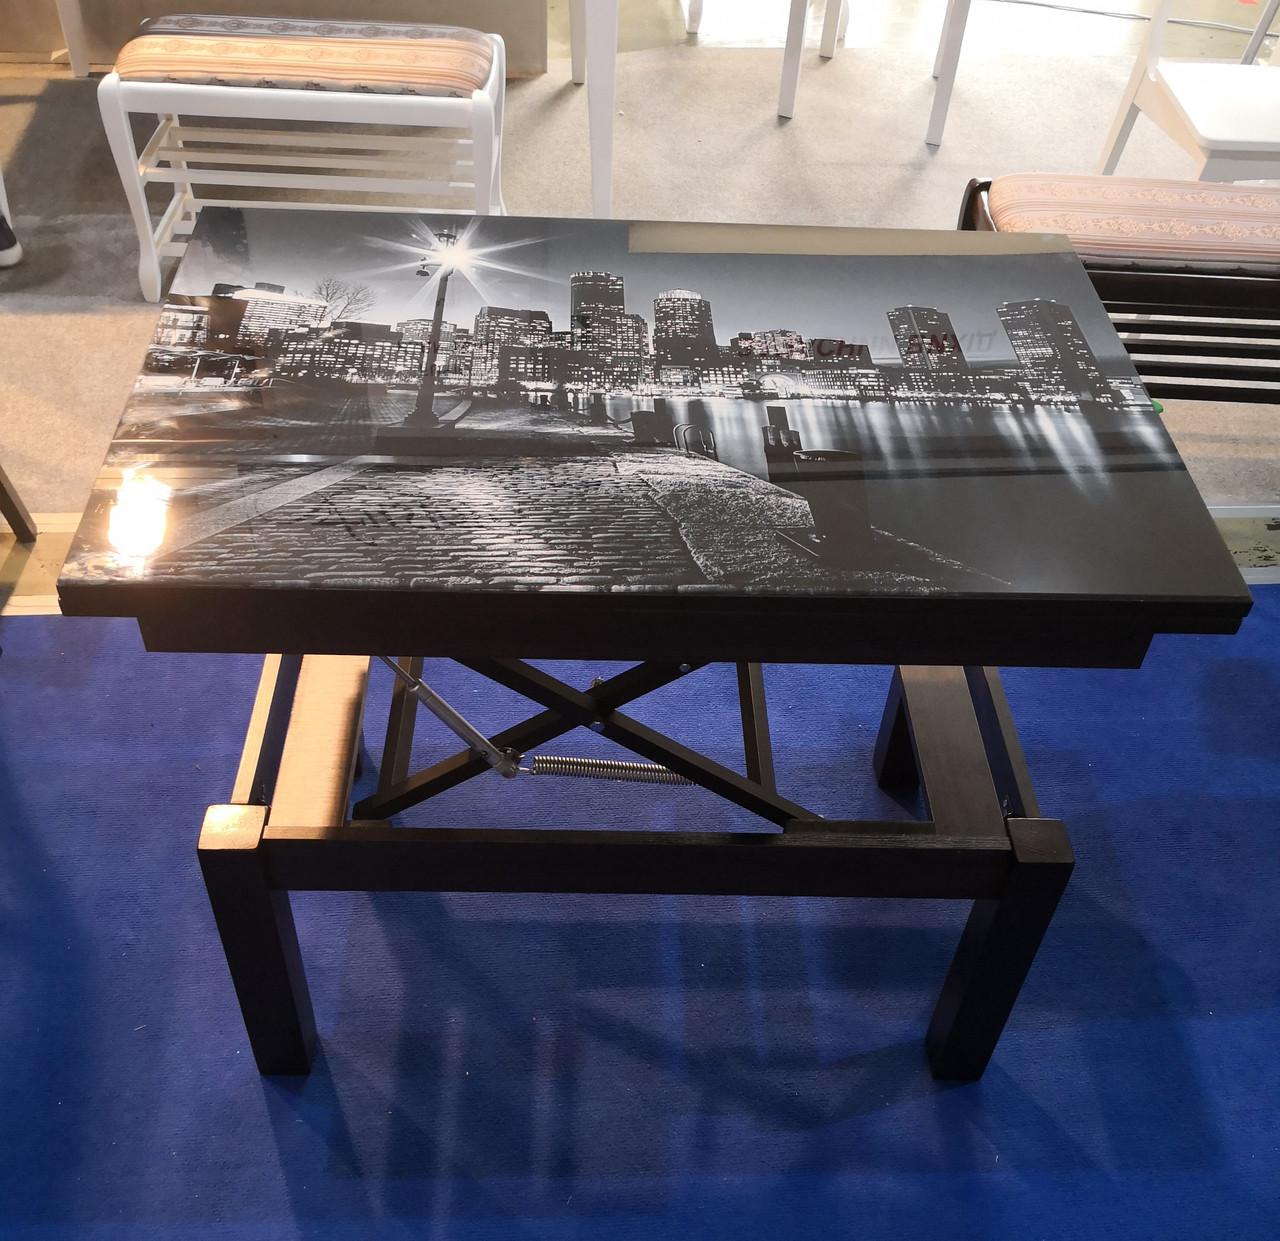 Стол транформер Флай венге стекло 04-123 (город)